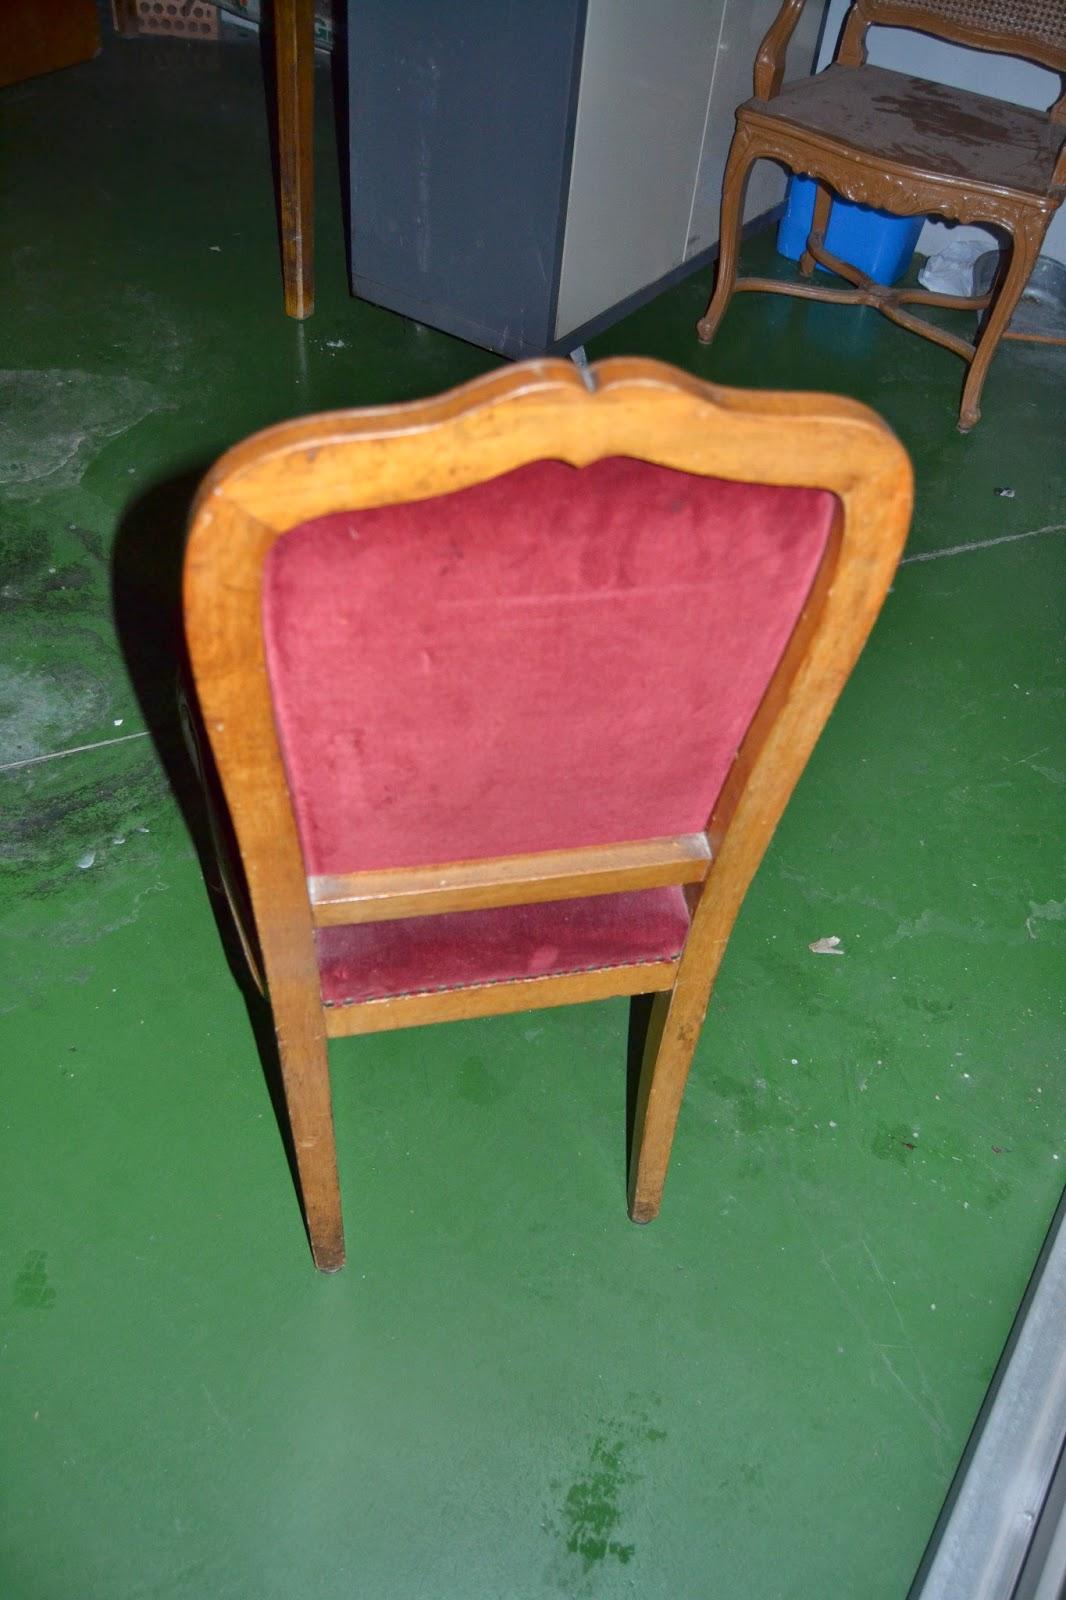 Taller de restauraci n lila sillas para restaurar - Sillas para restaurar ...